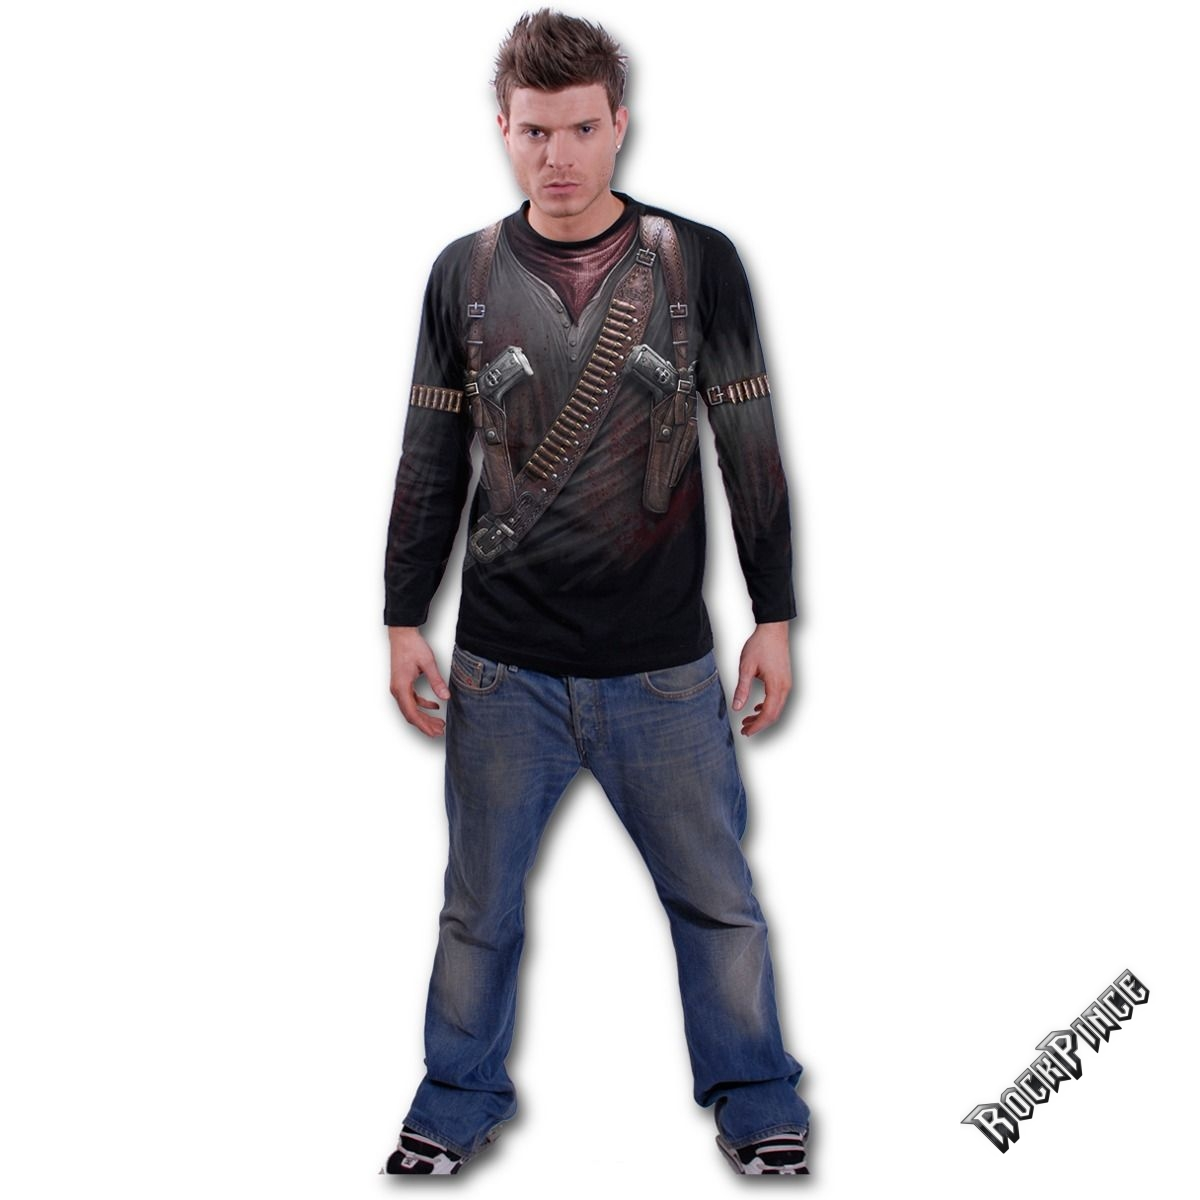 HOLSTER WRAP - Allover Longsleeve T-Shirt Black - W022M304